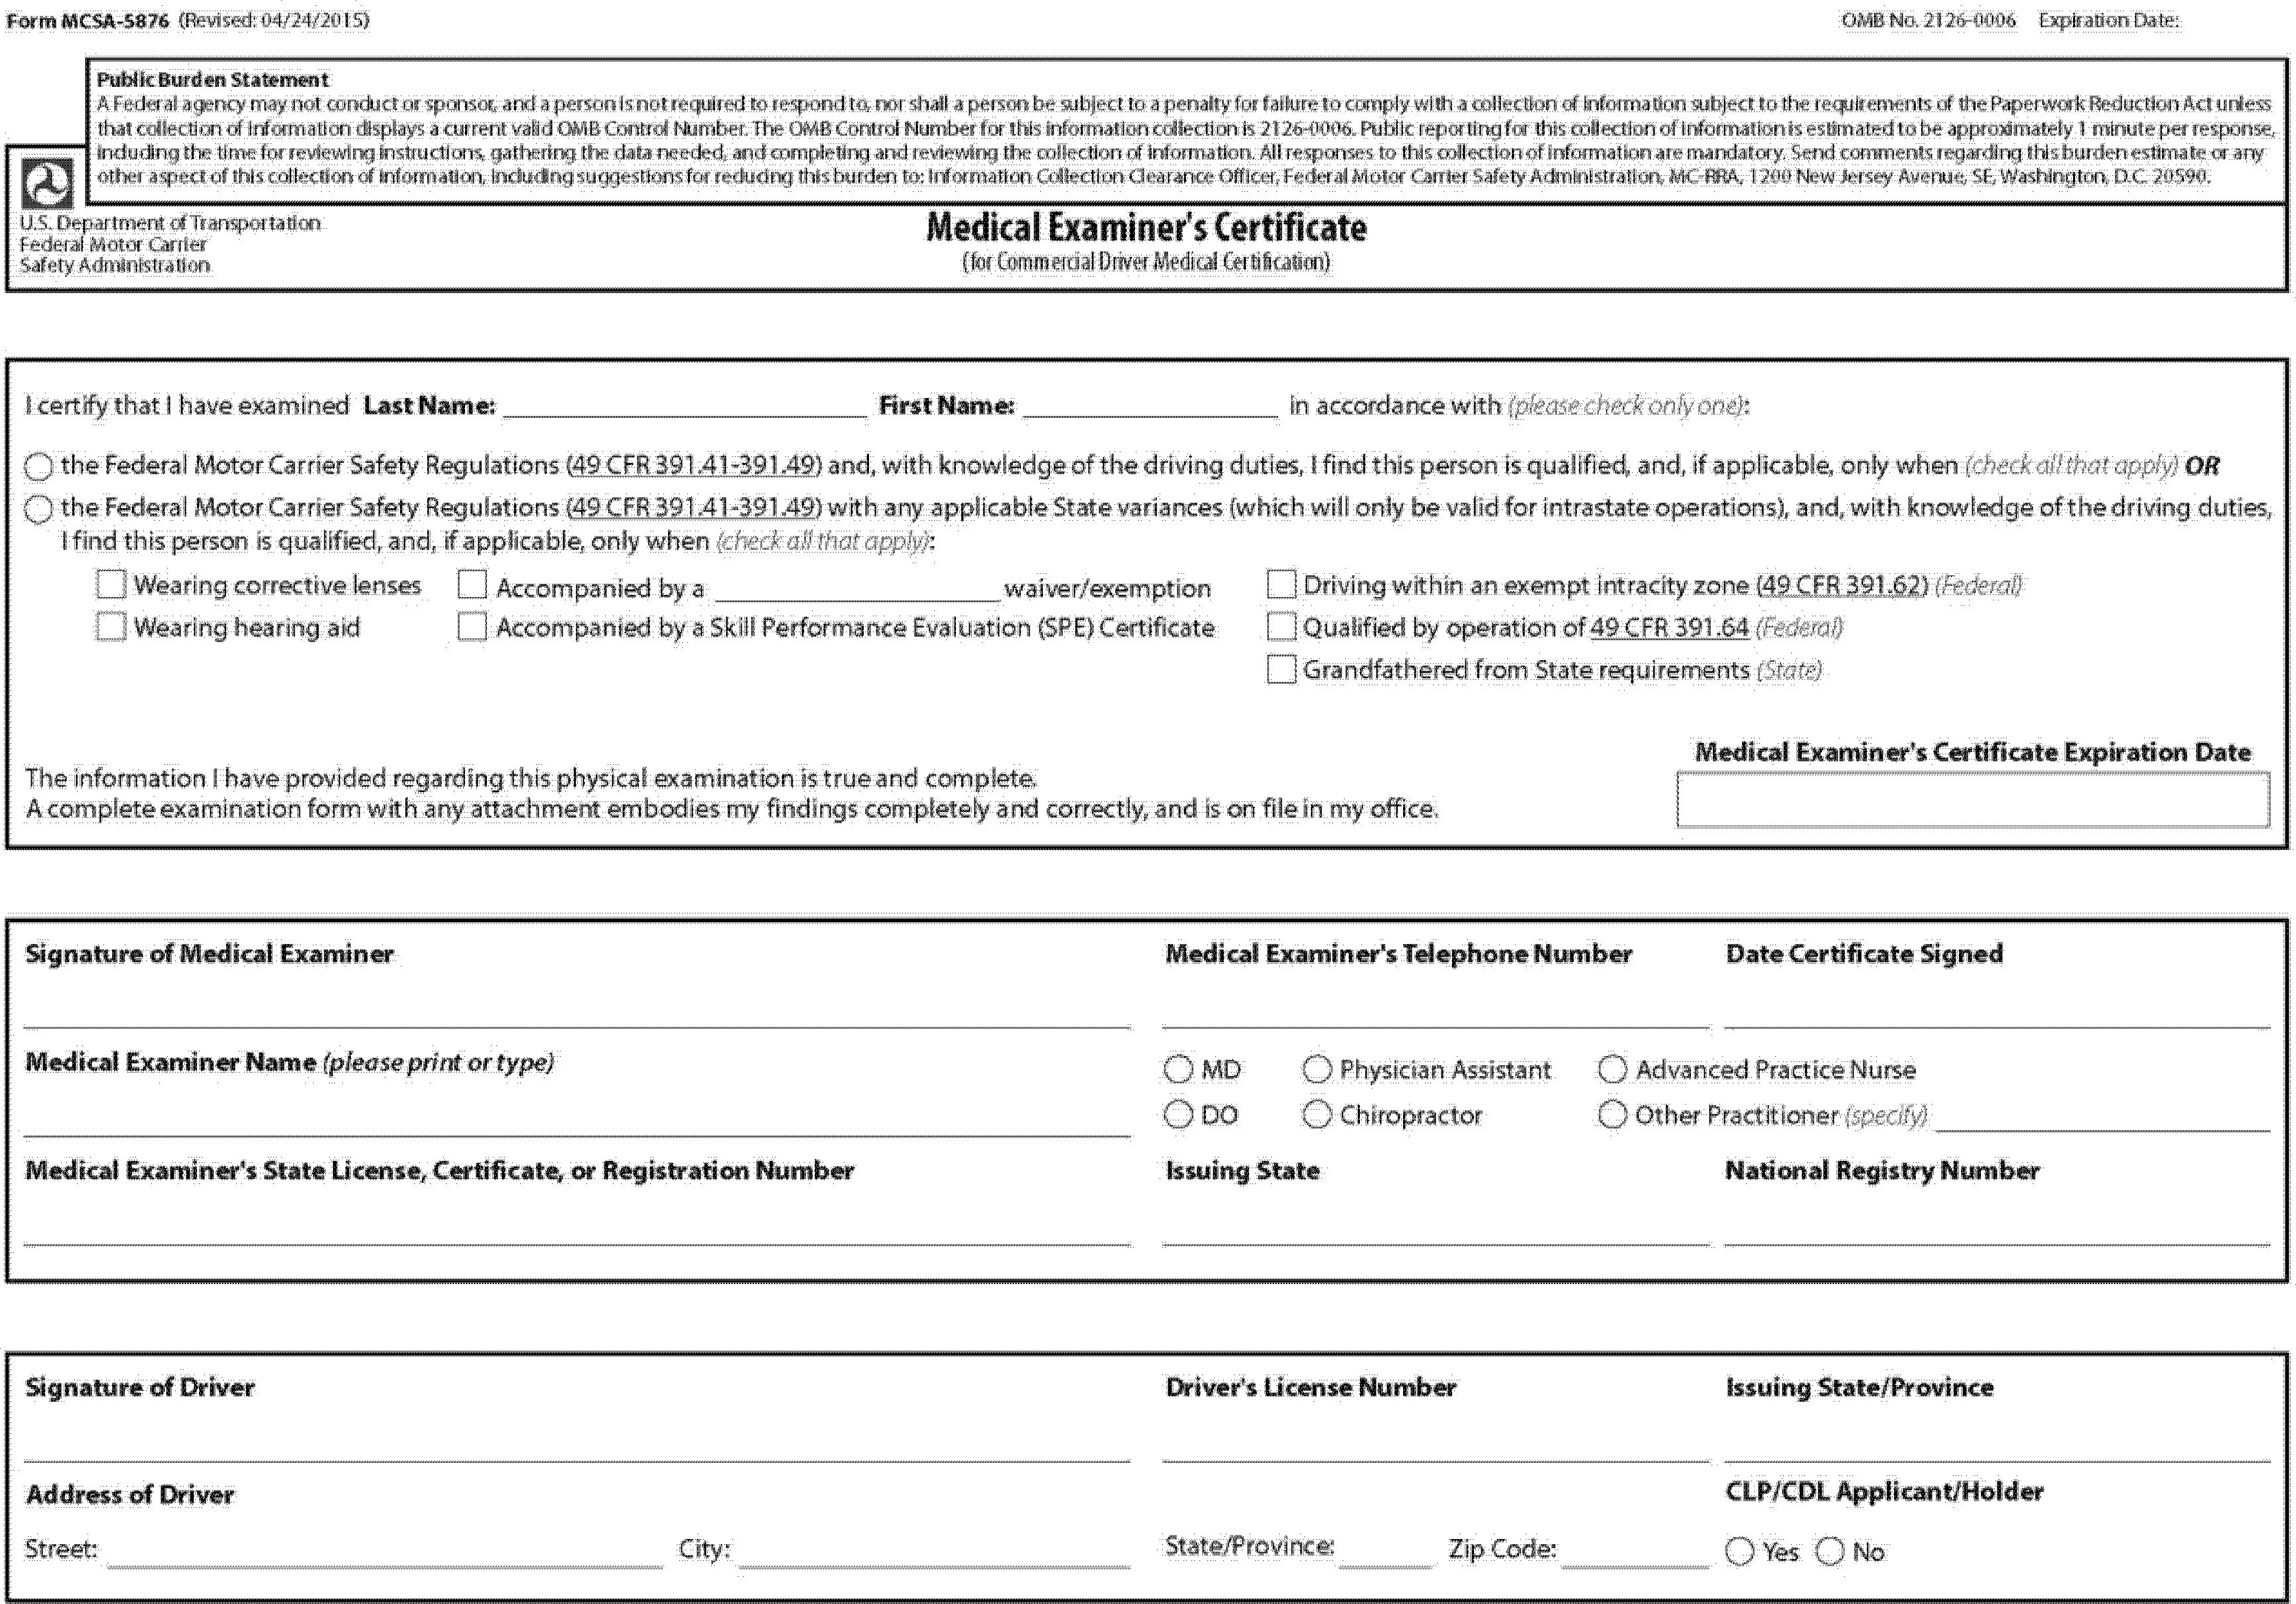 Medical Examiners Certificate form Mcsa 5876 original